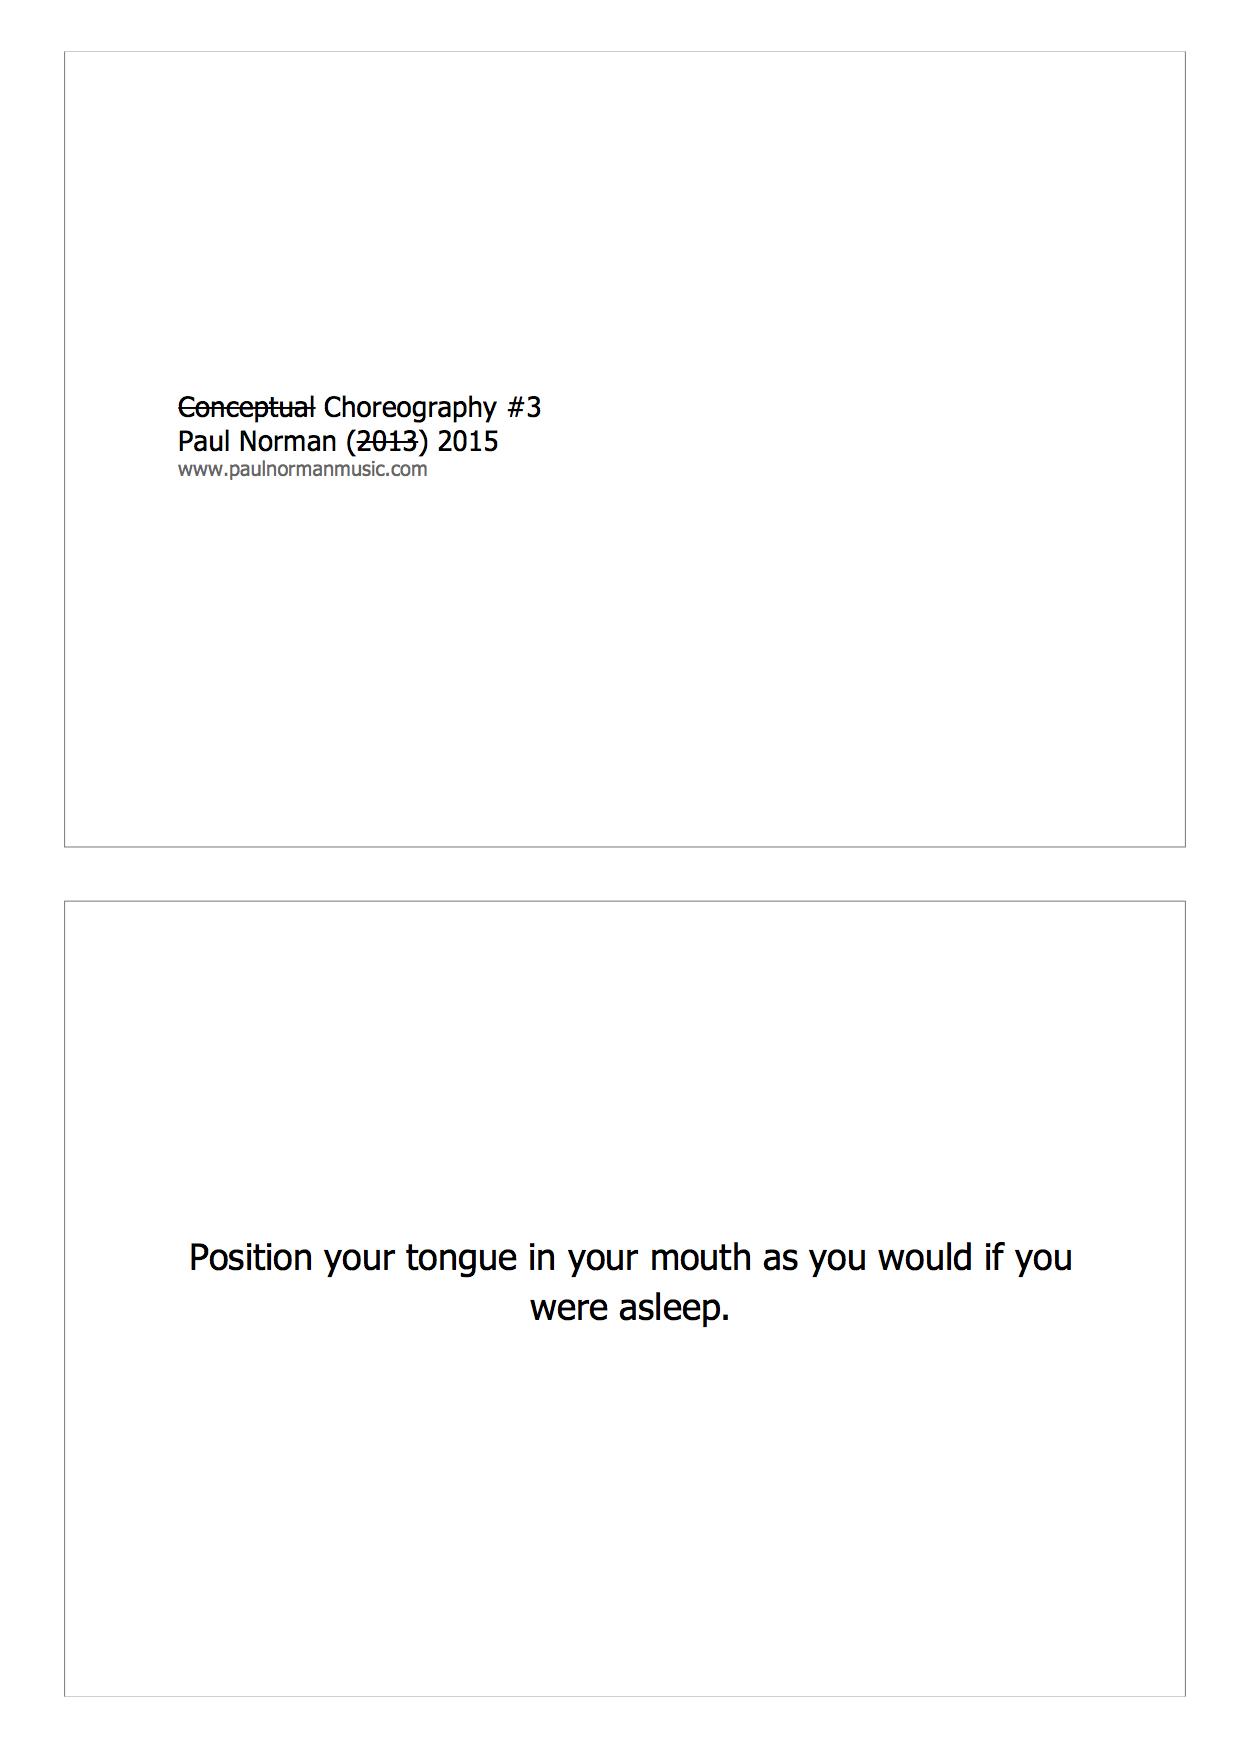 Choregraphy #3